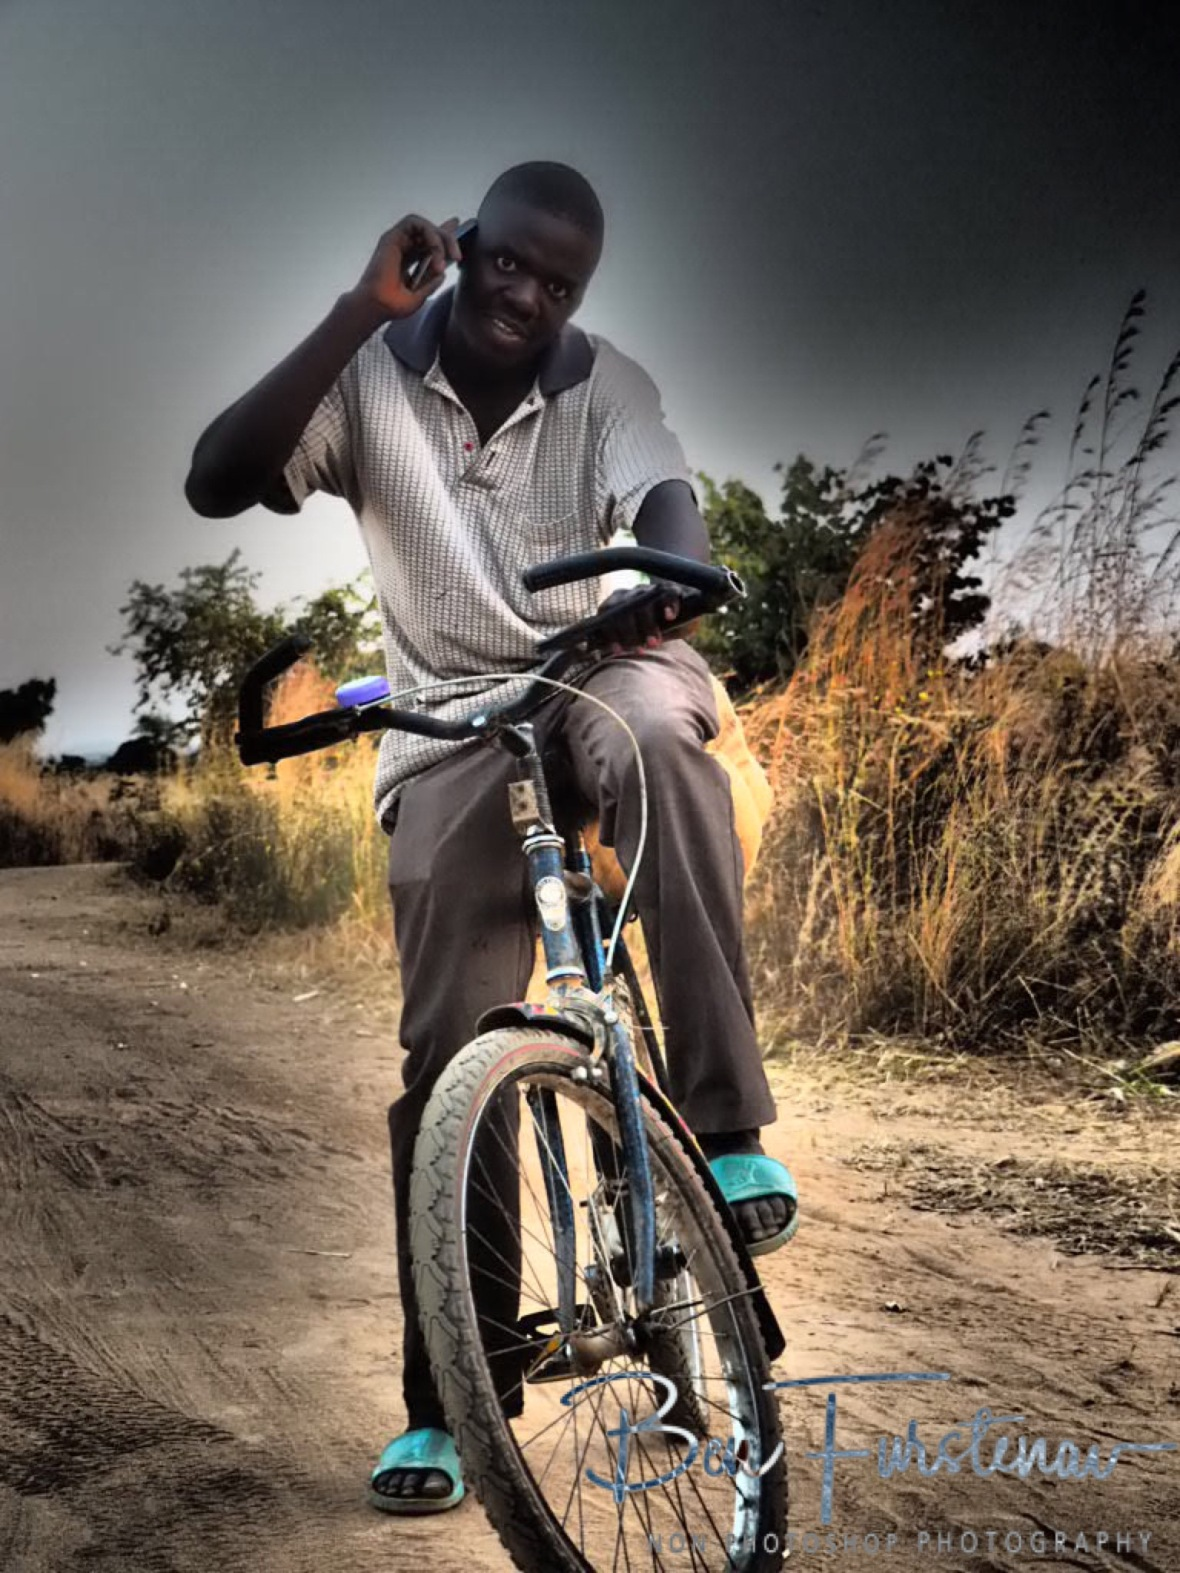 Looking cool on the bike, Northern Region, Malawi